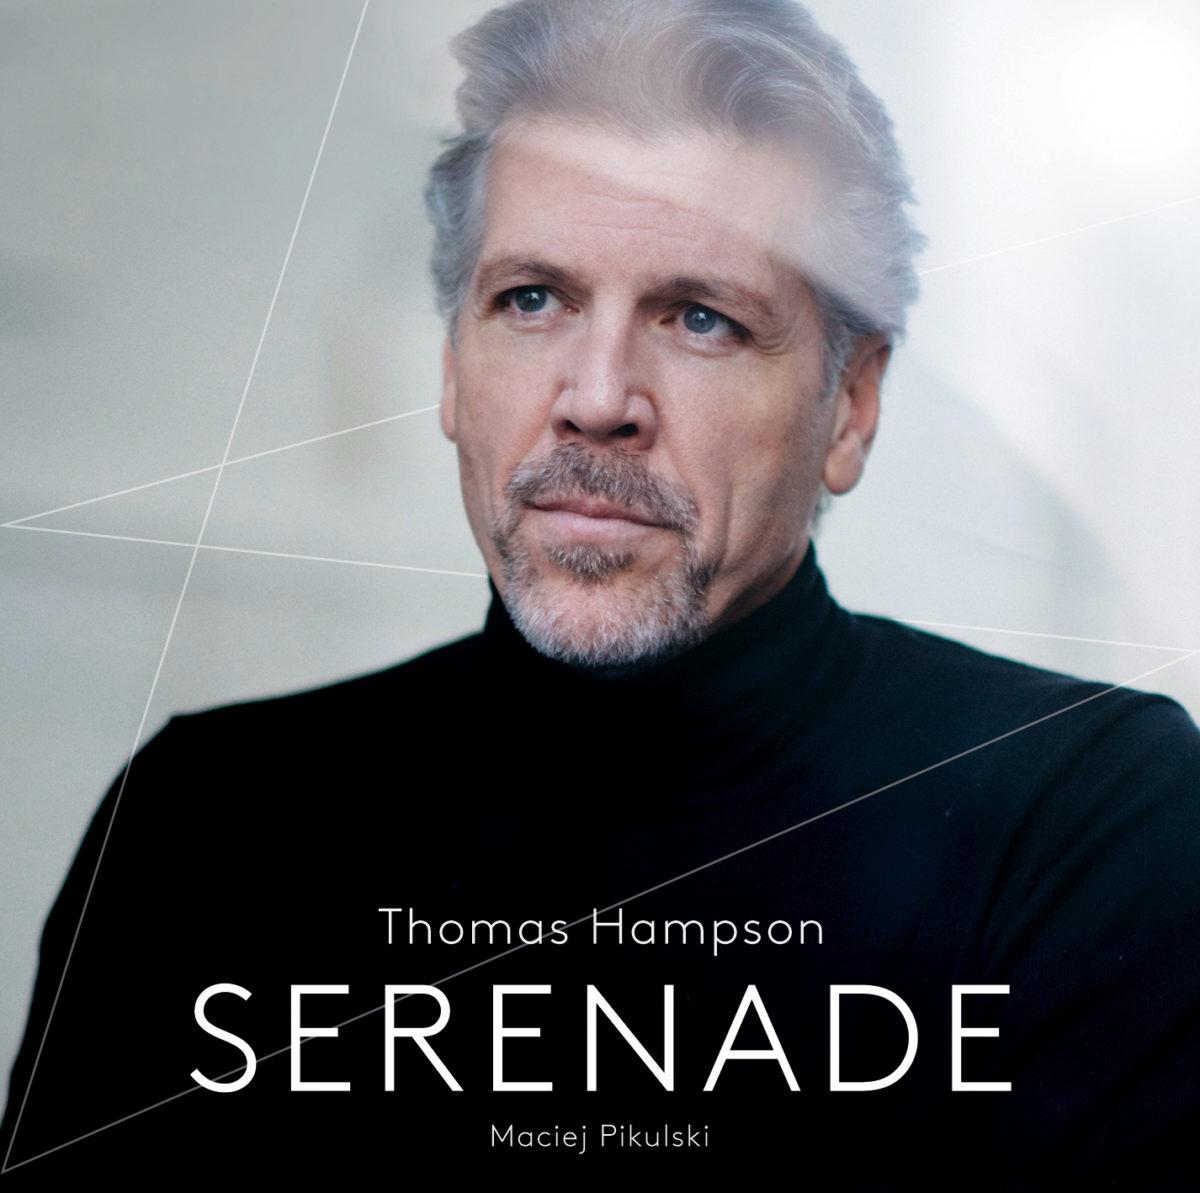 CD HAMPSON Serenade-cover-1200x1193.jpg